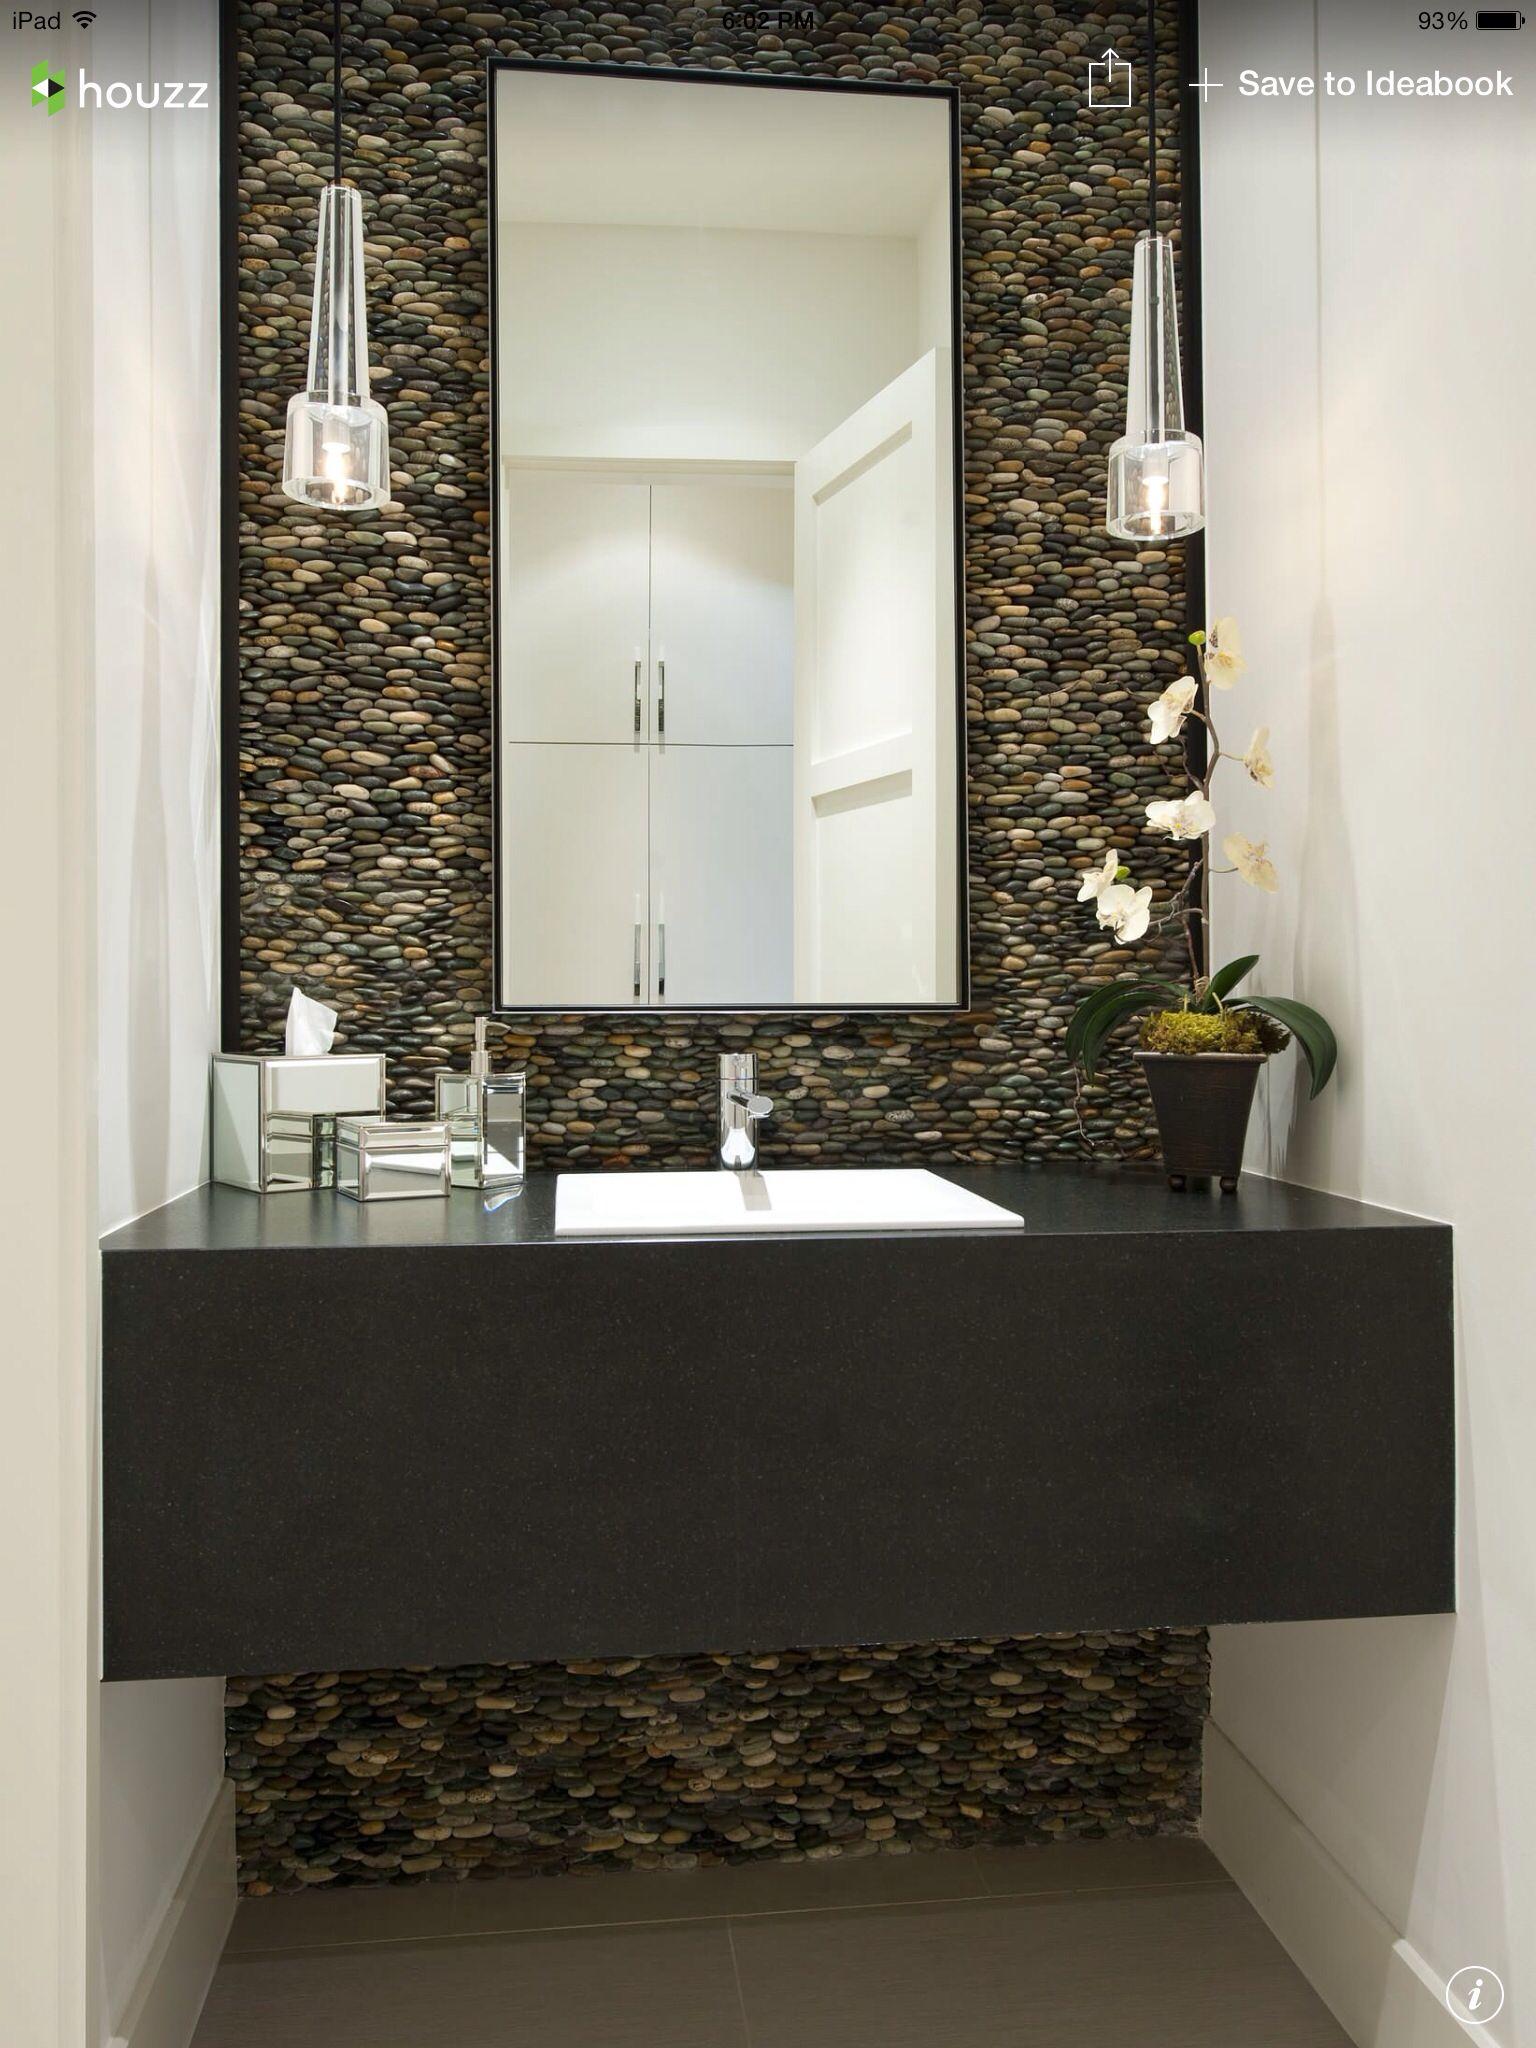 Half bath stacked pebble backsplash, hanging lights